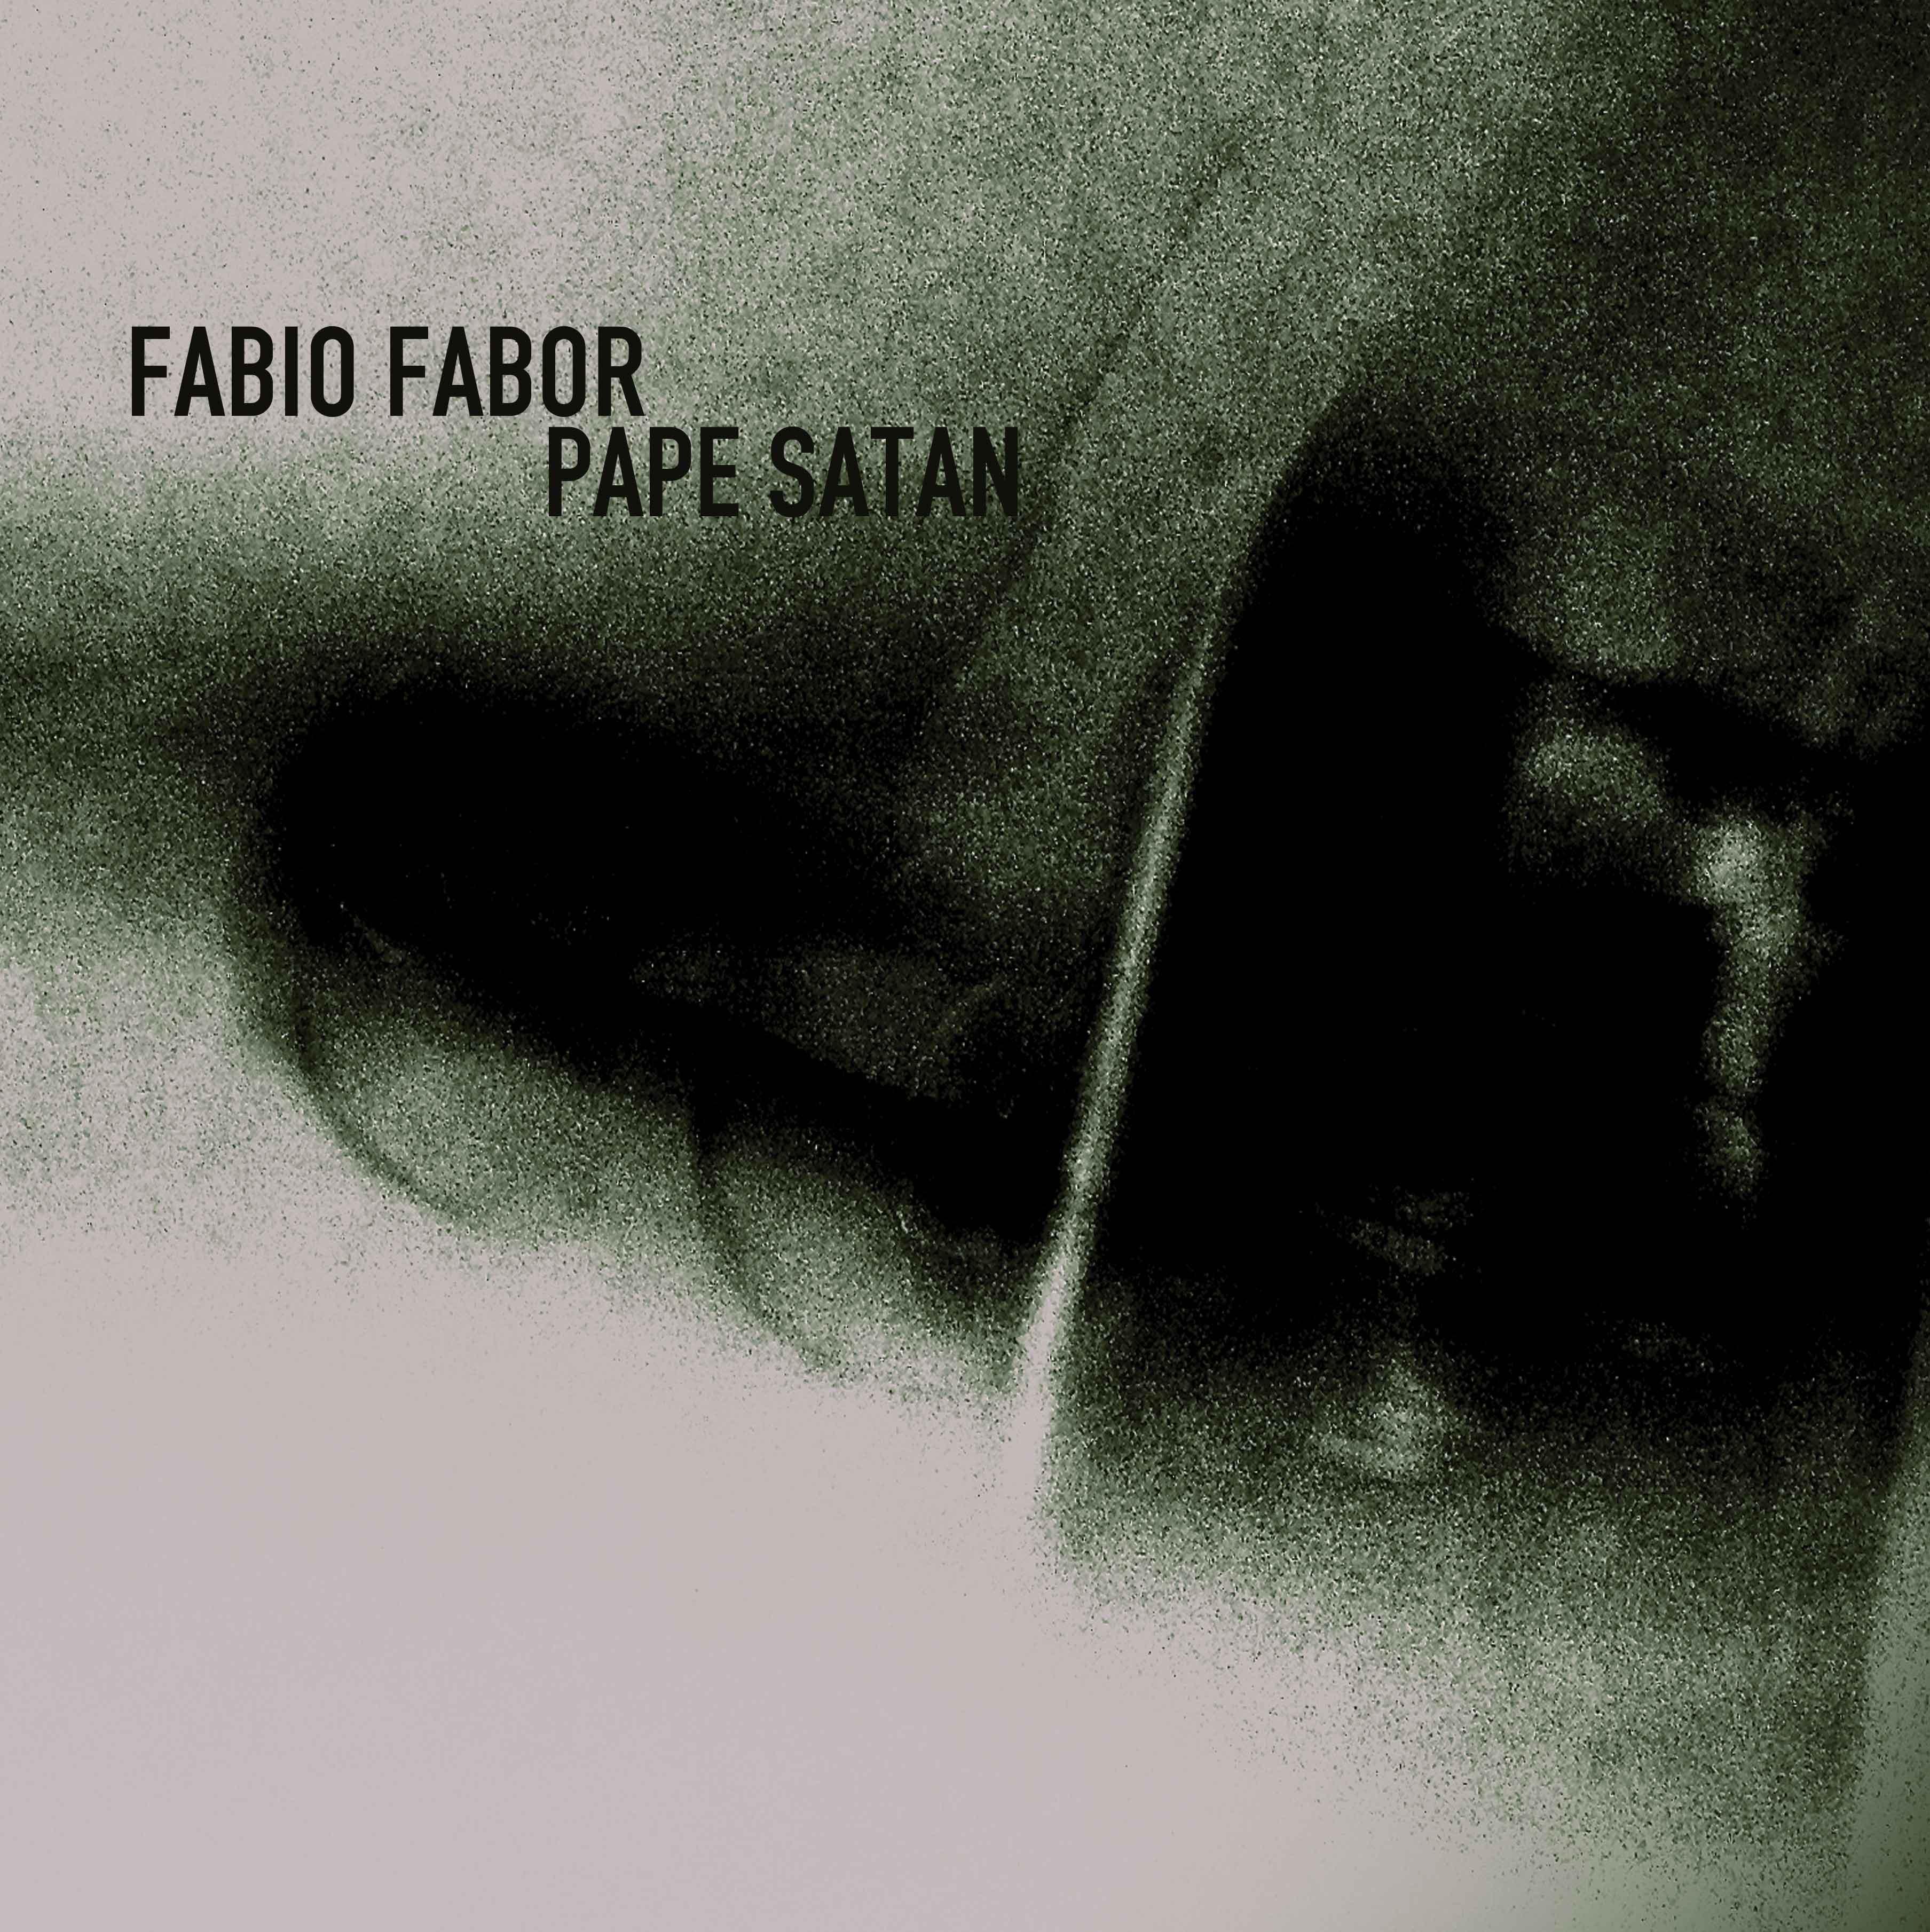 Fabio Fabor Pape Satan